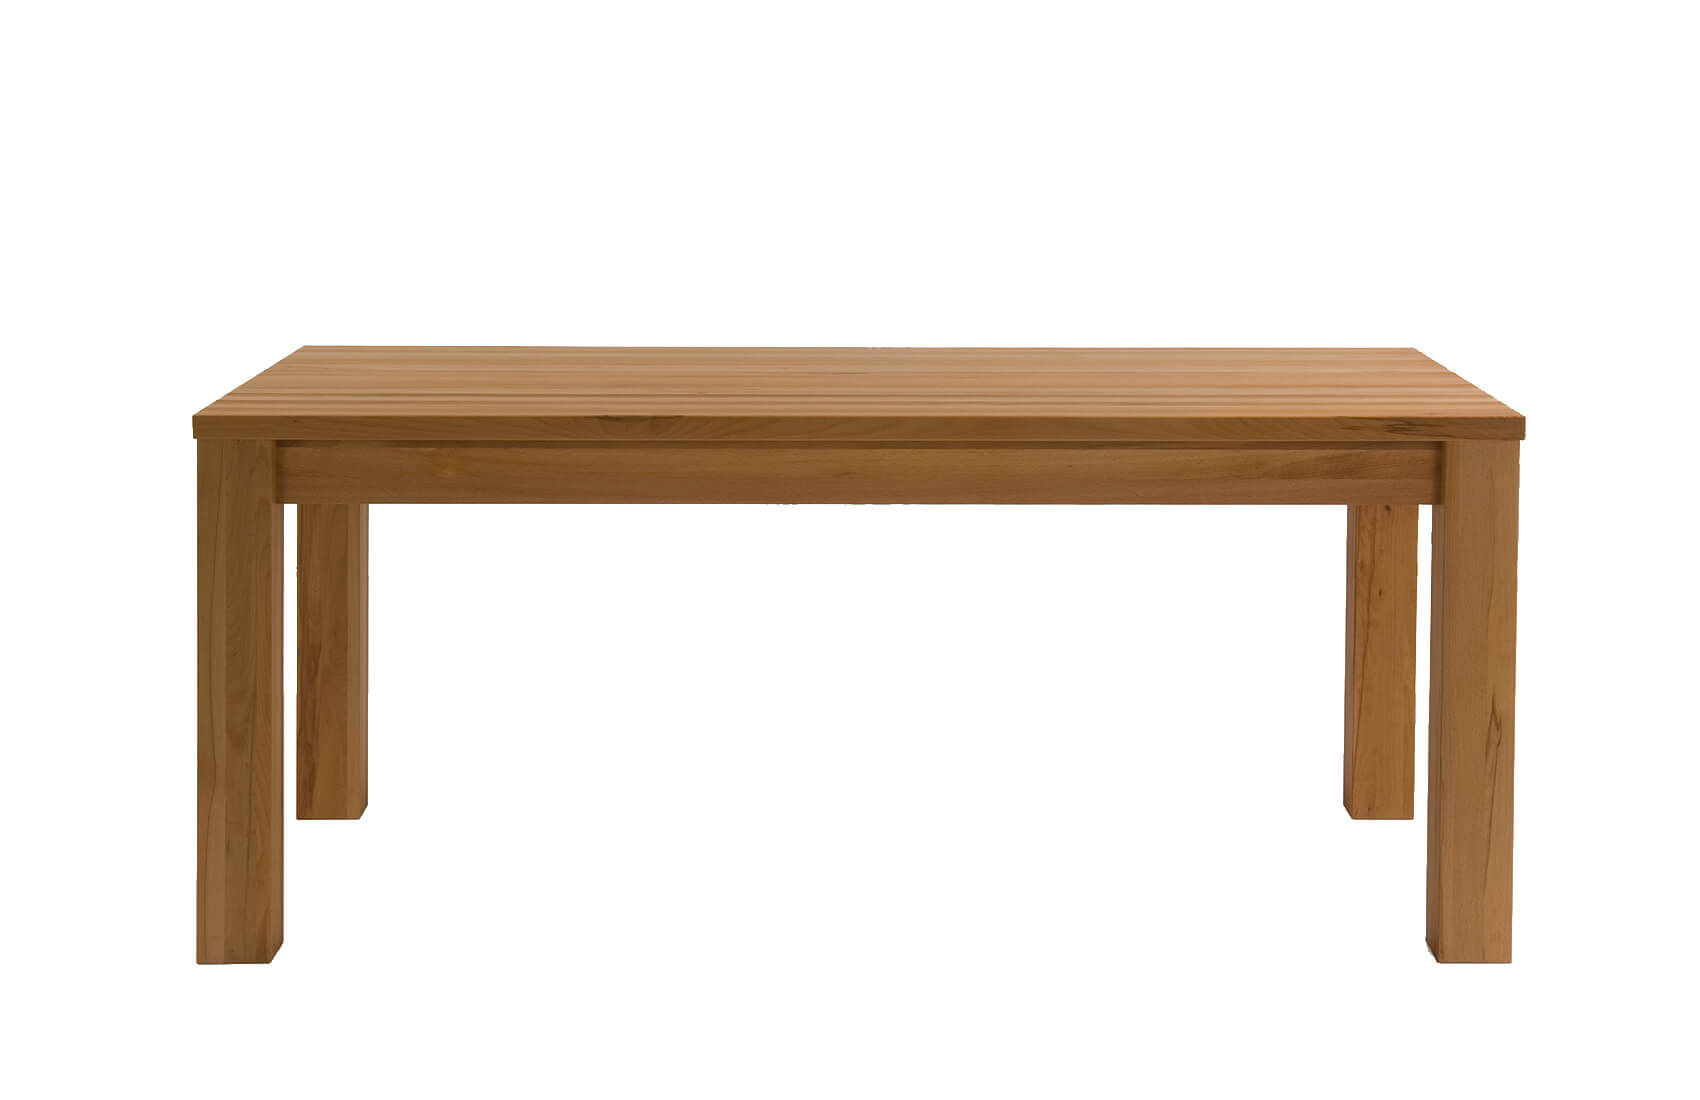 Tafeltisch Julia 0